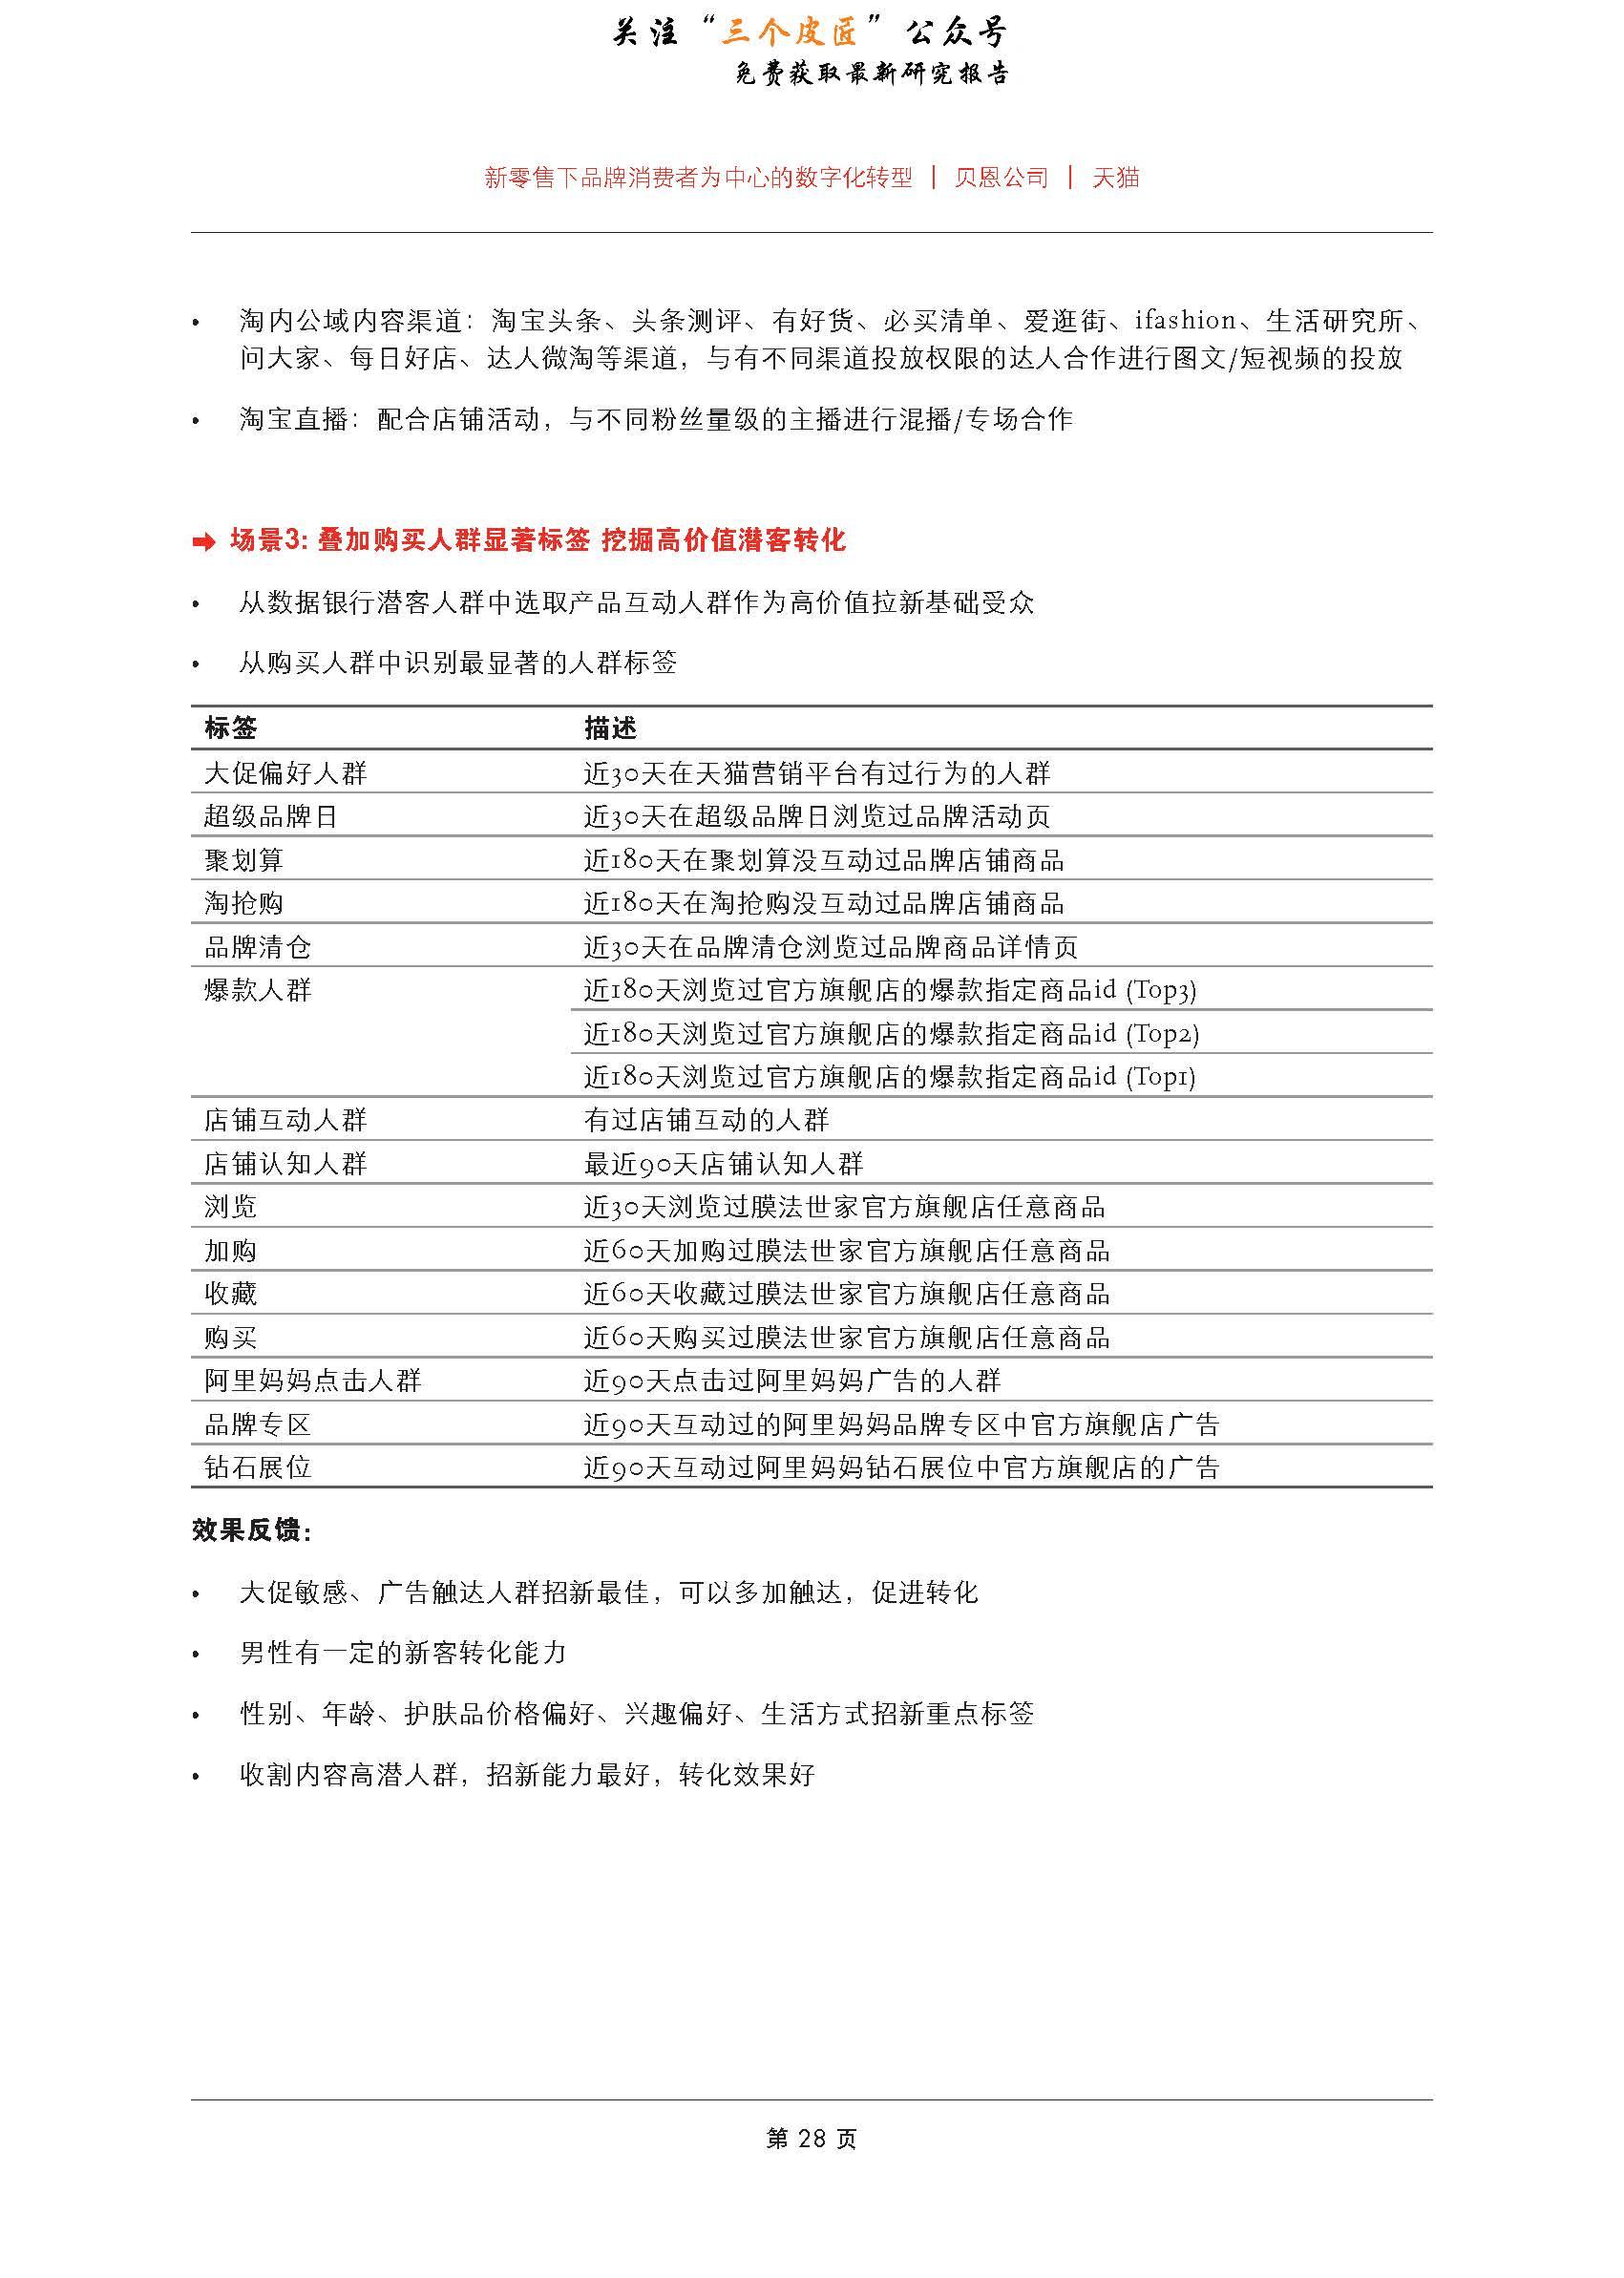 1_Page_30.jpg